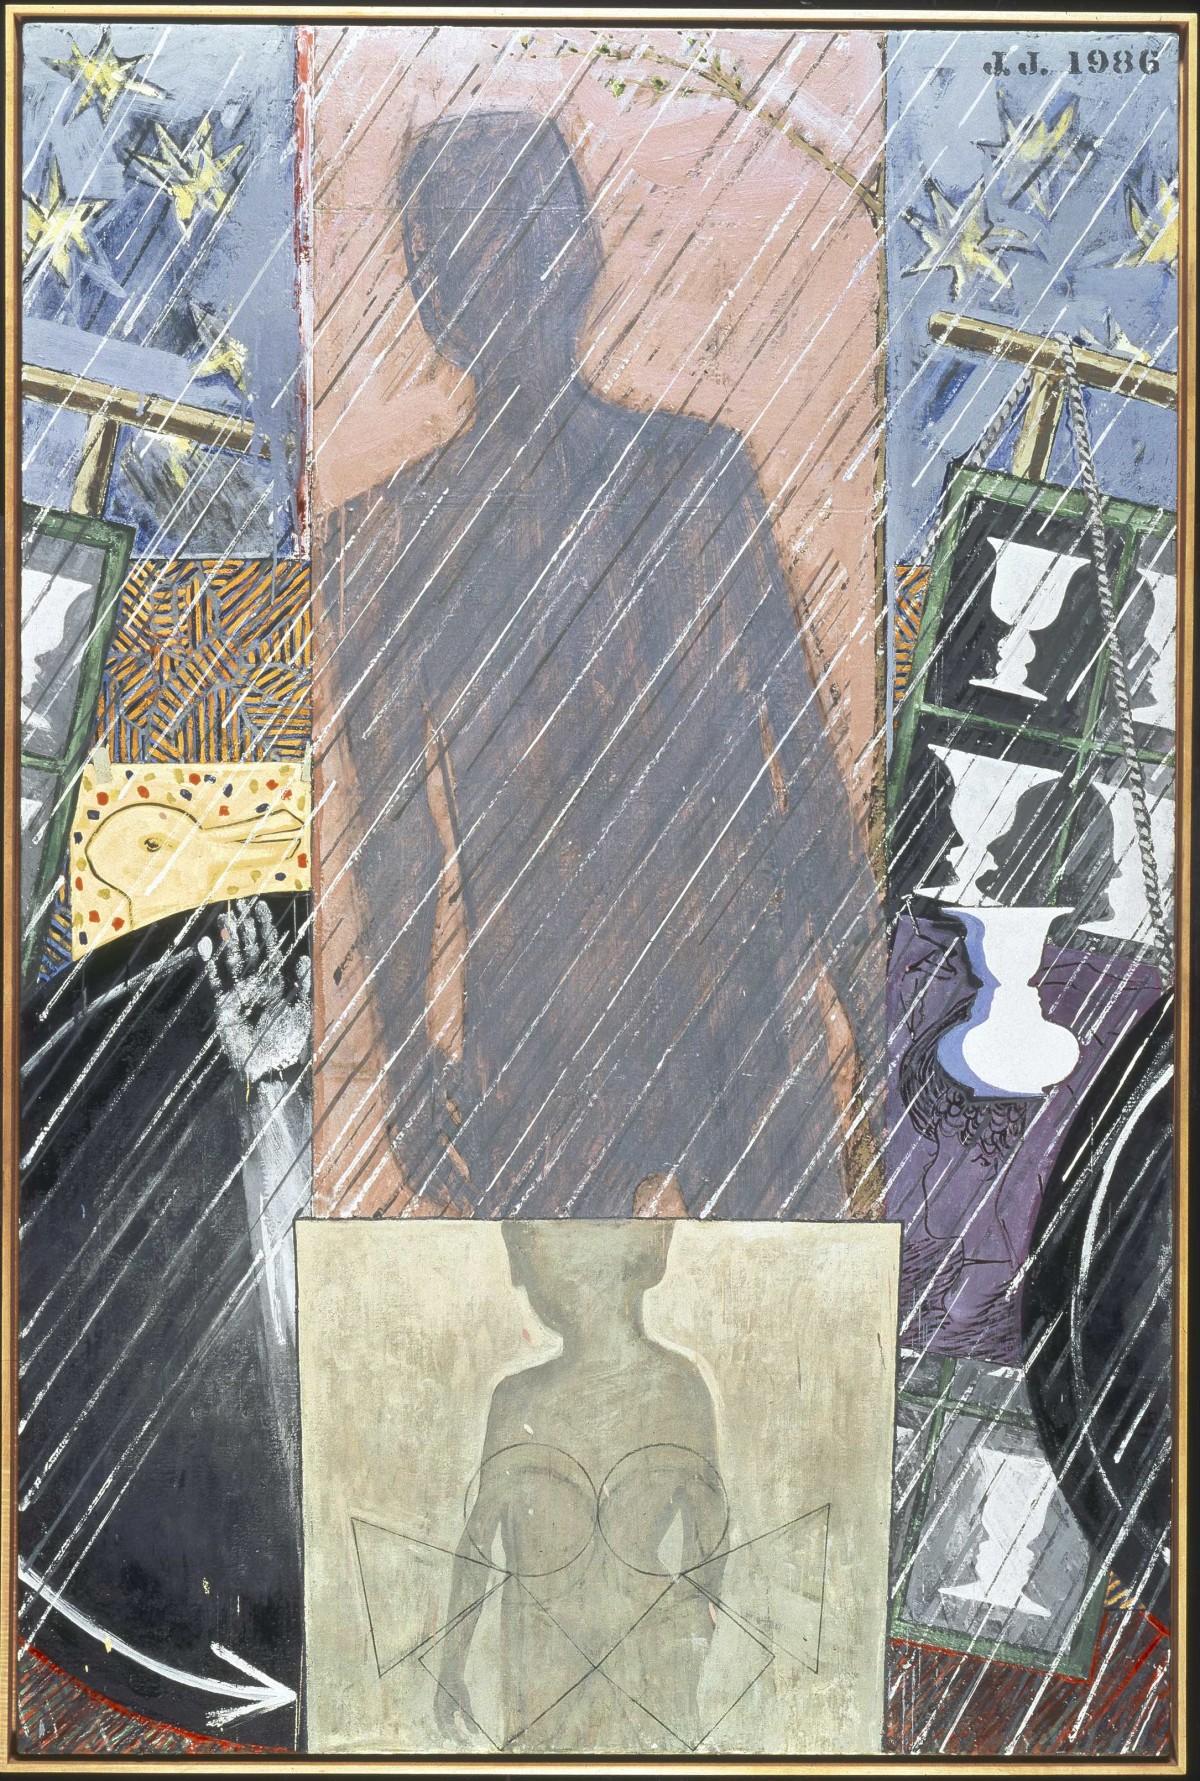 Jasper Johns, Spring, 1986